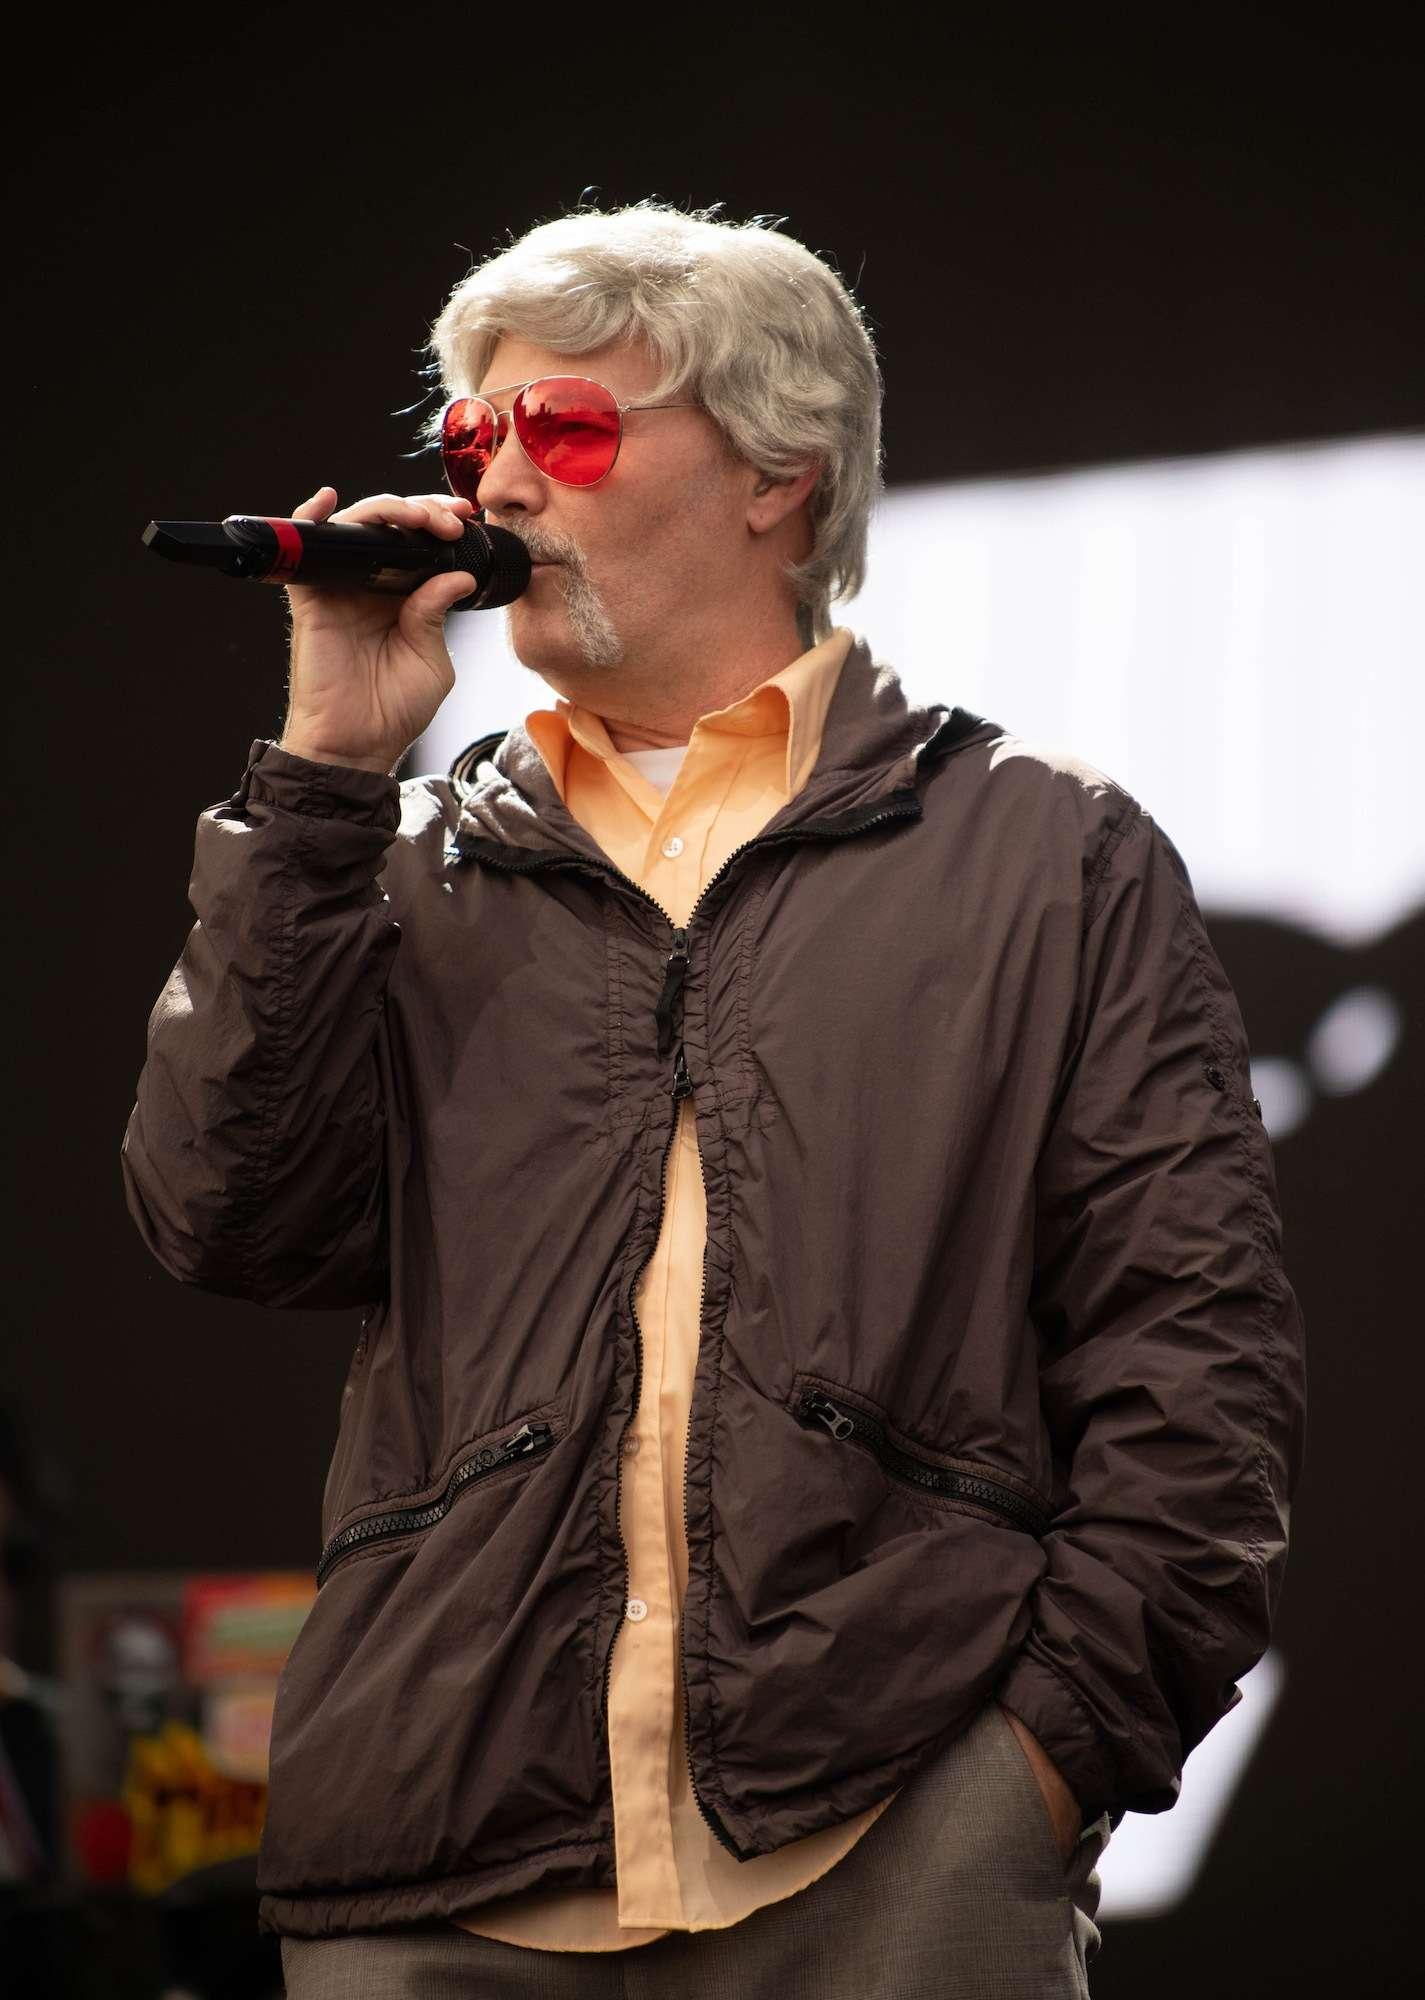 Limp Bizkit Live at Lollapalooza [GALLERY] 9